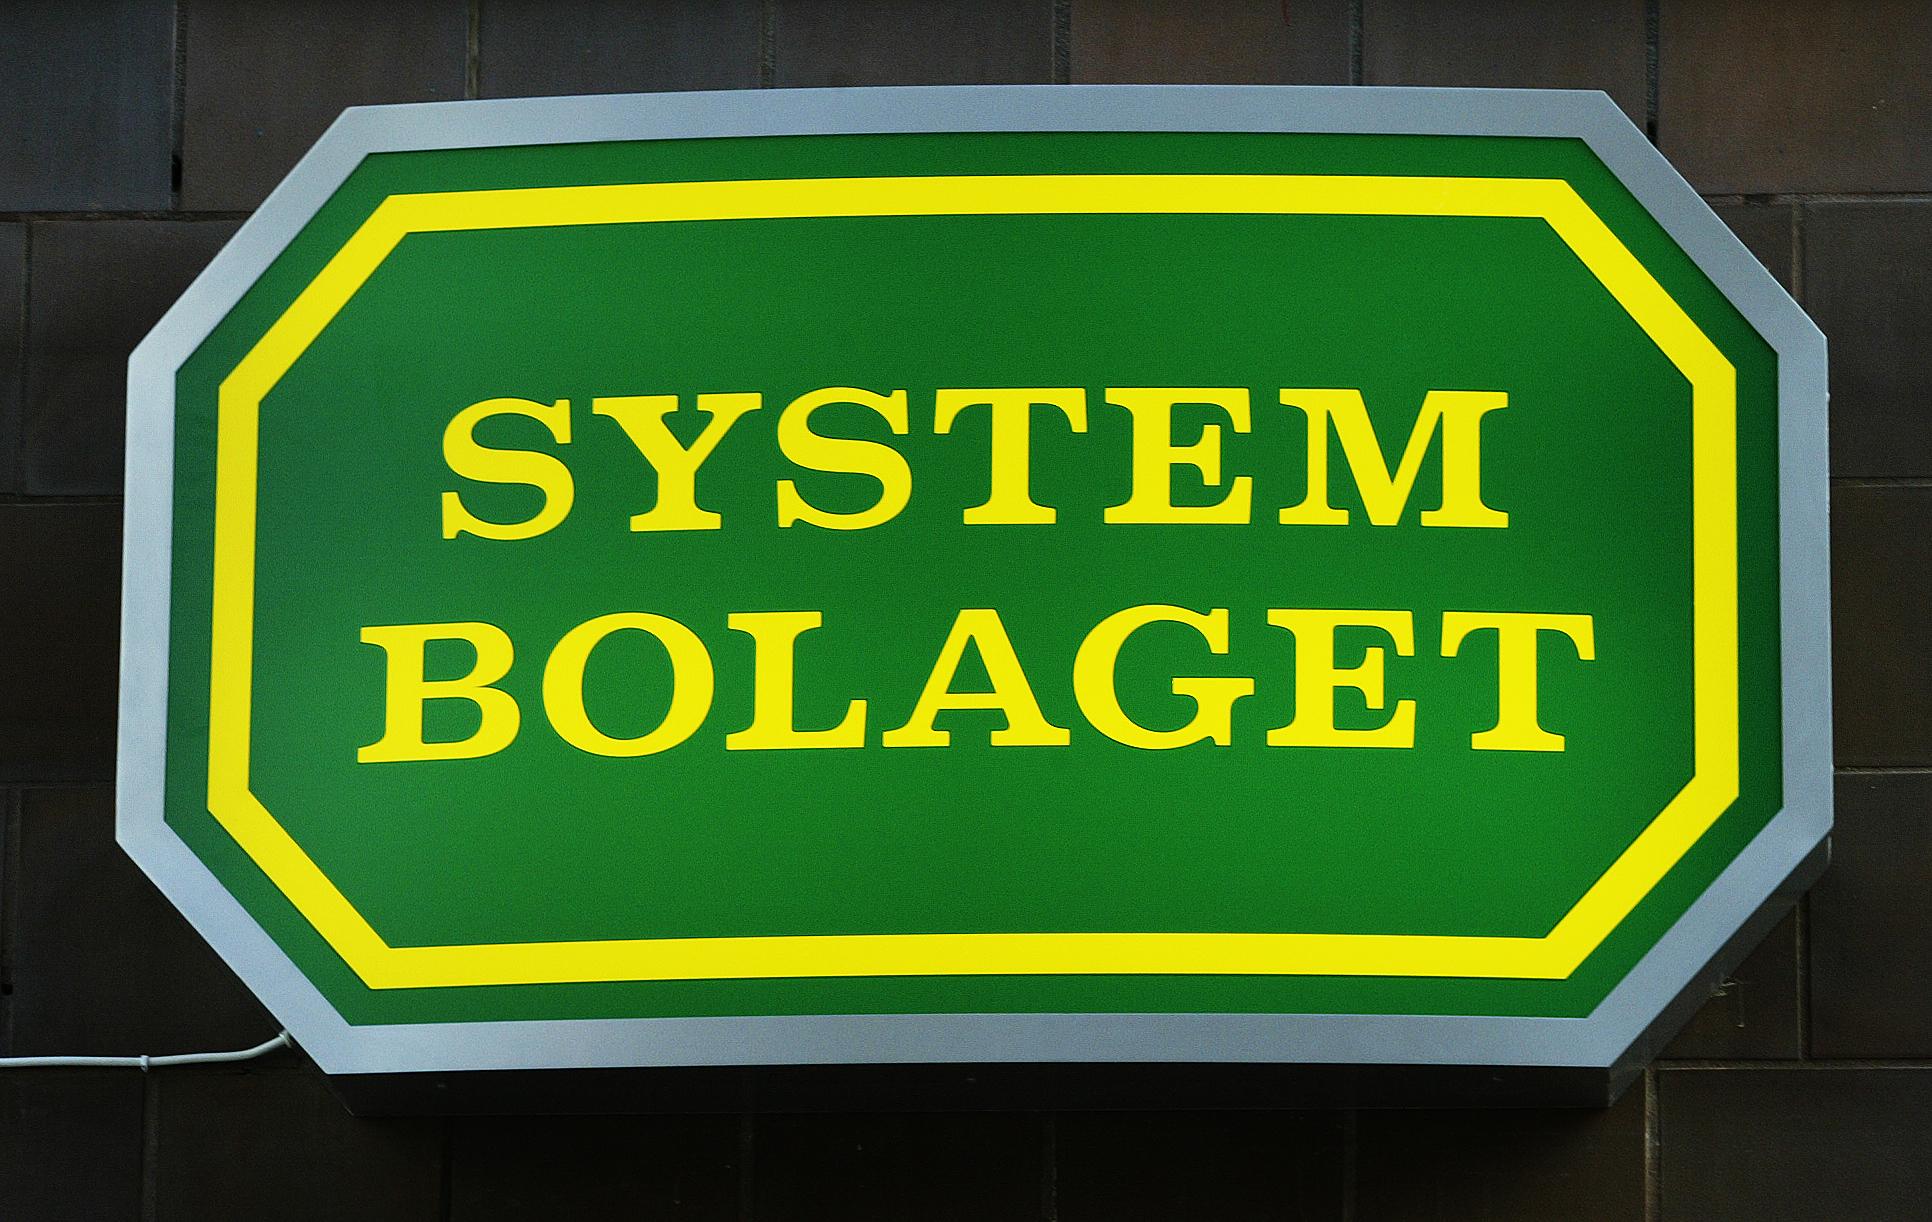 https://www.systembolaget.se